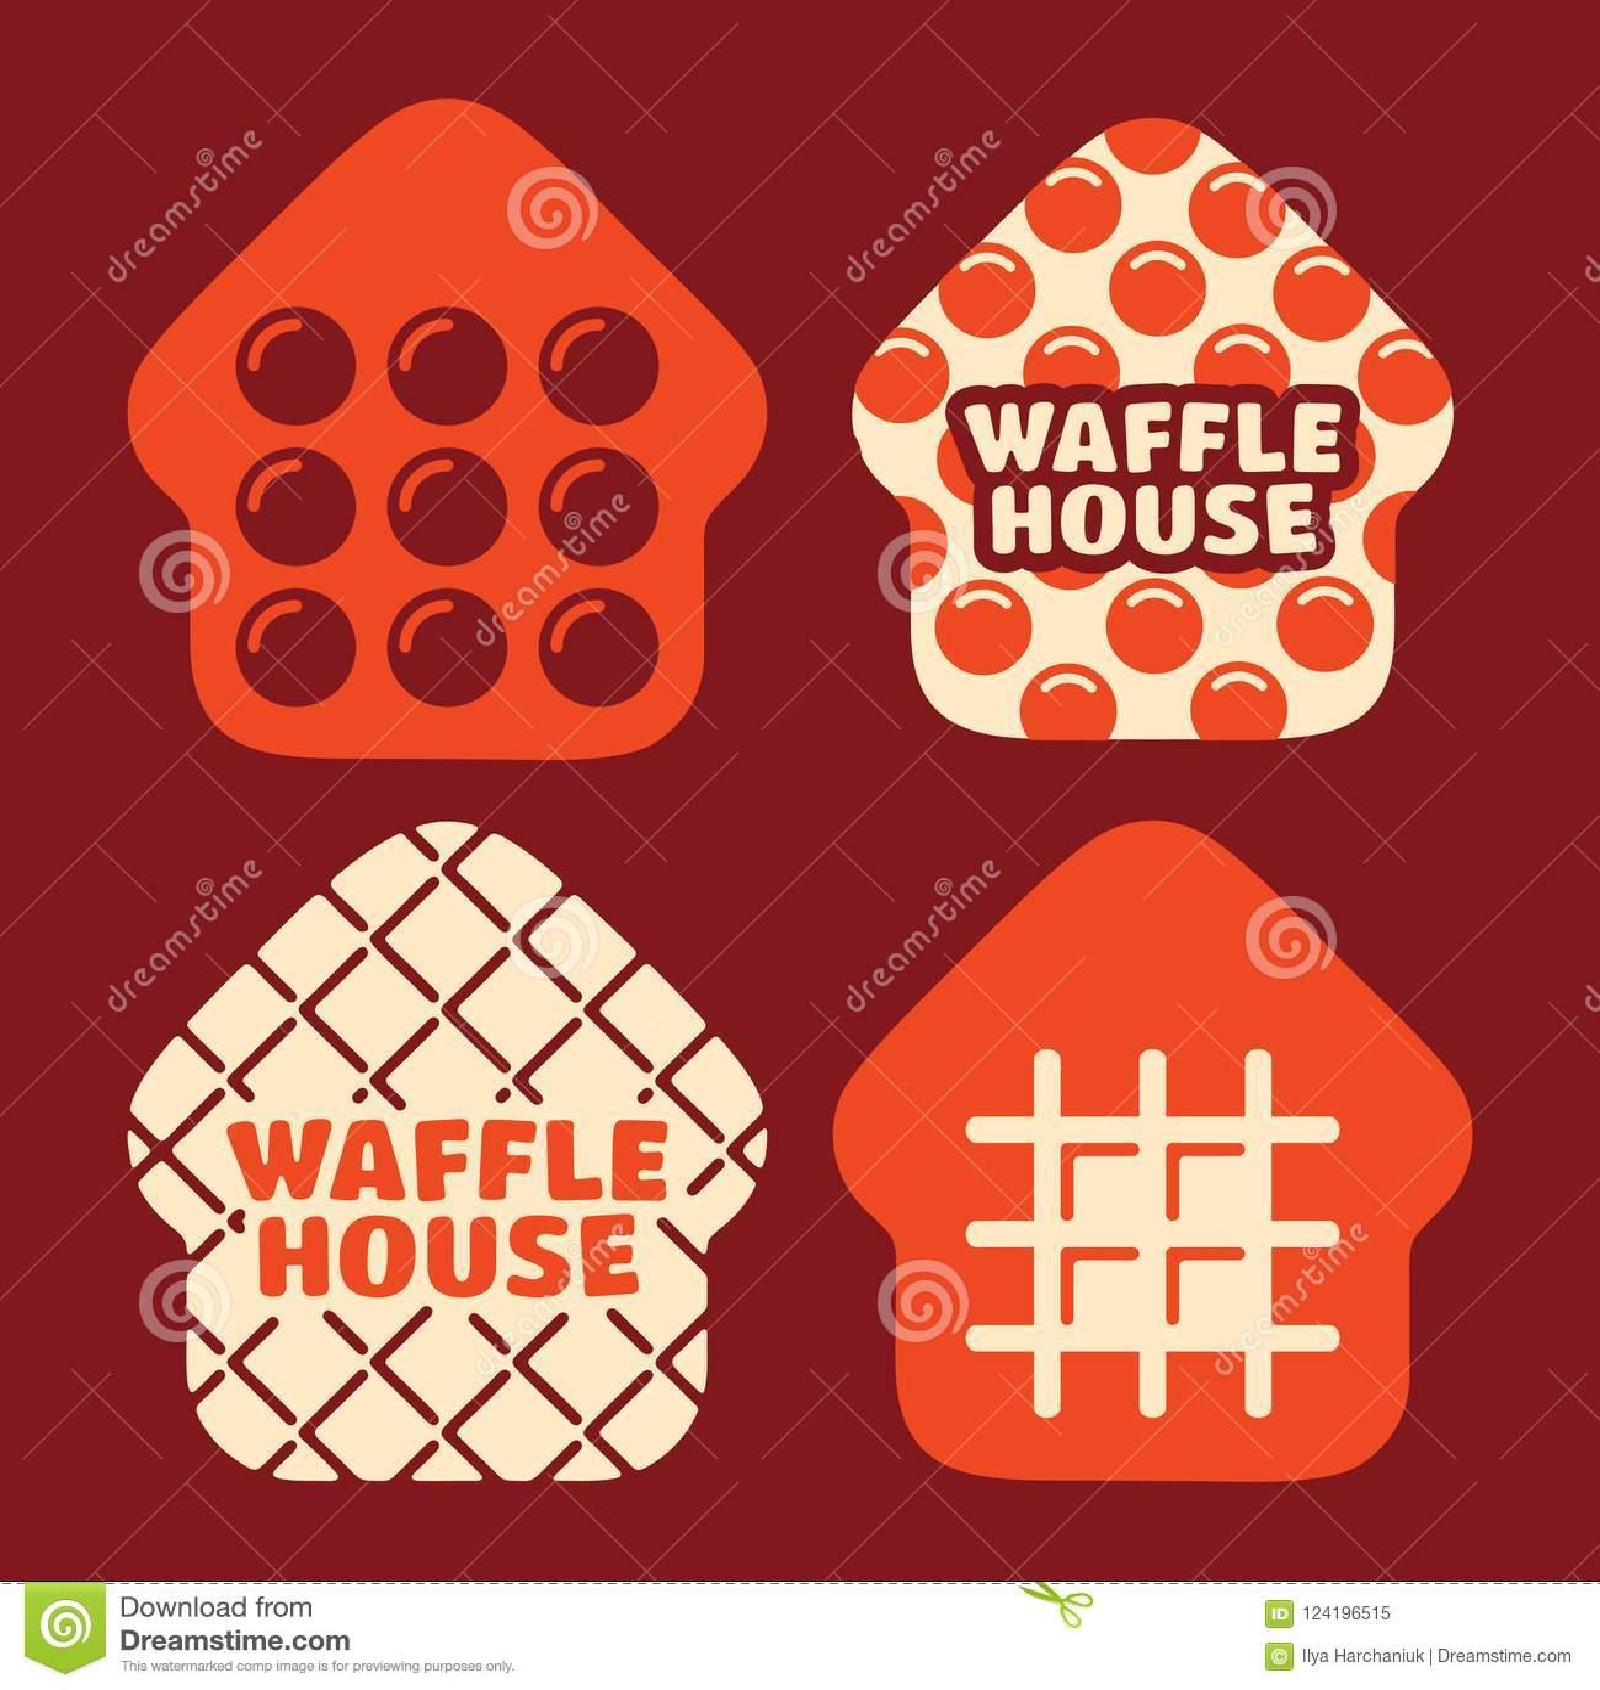 Modern Professional Vector Set Logo Waffle House In Orange Theme Stock Illustration Illustration Of House Bakery 124196515 Free vector logo waffle house. dreamstime com